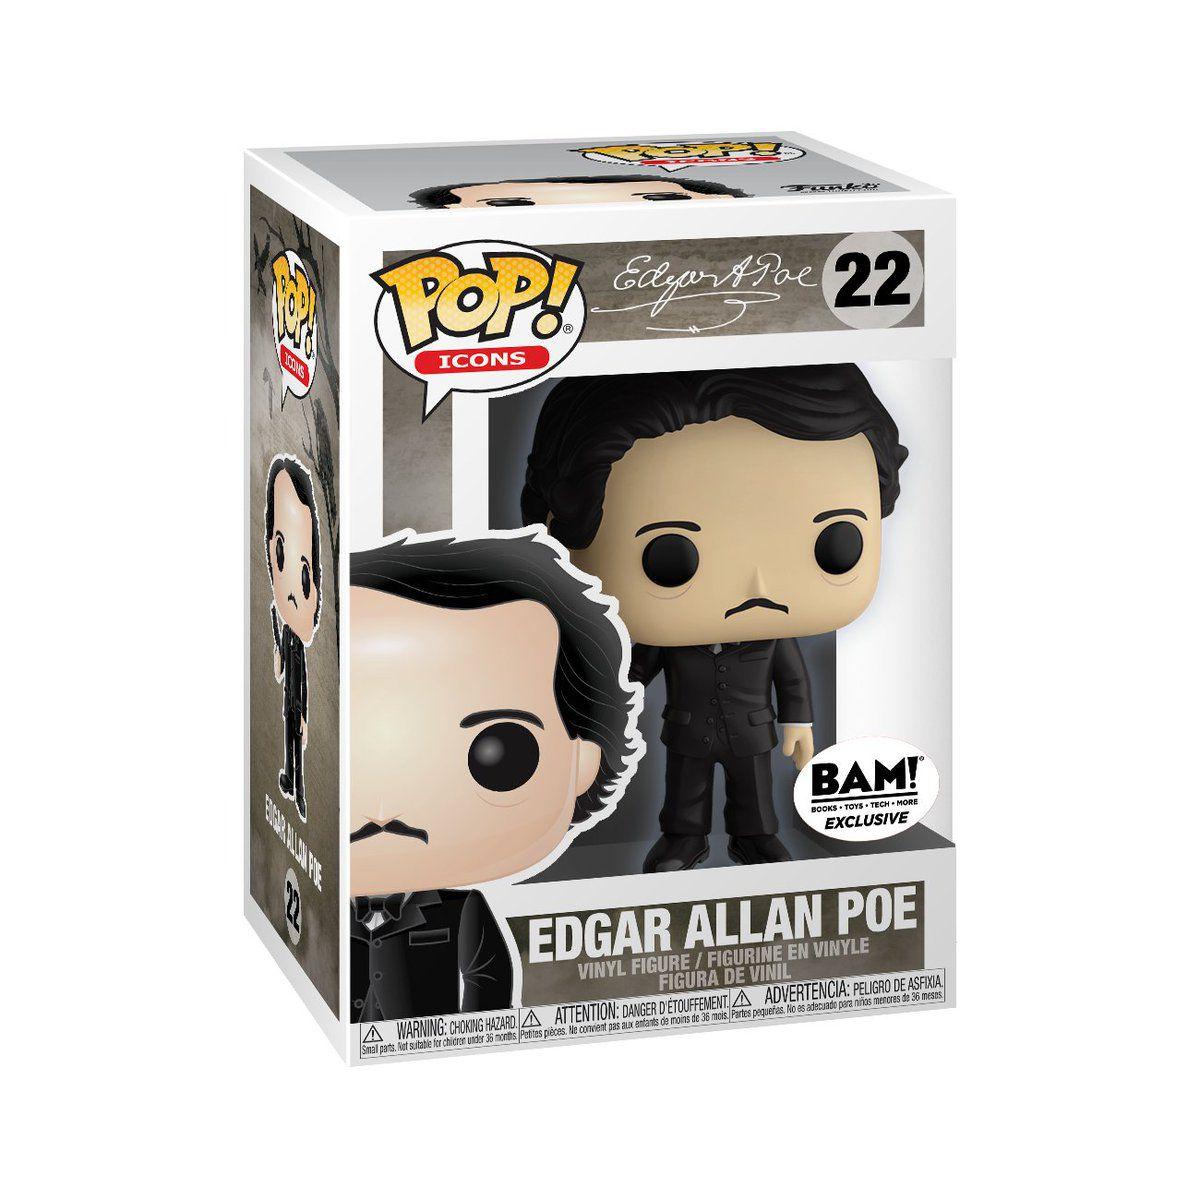 Funko Pop Edgar Allan Poe com Corvo Exclusivo Bam 22  - Game Land Brinquedos